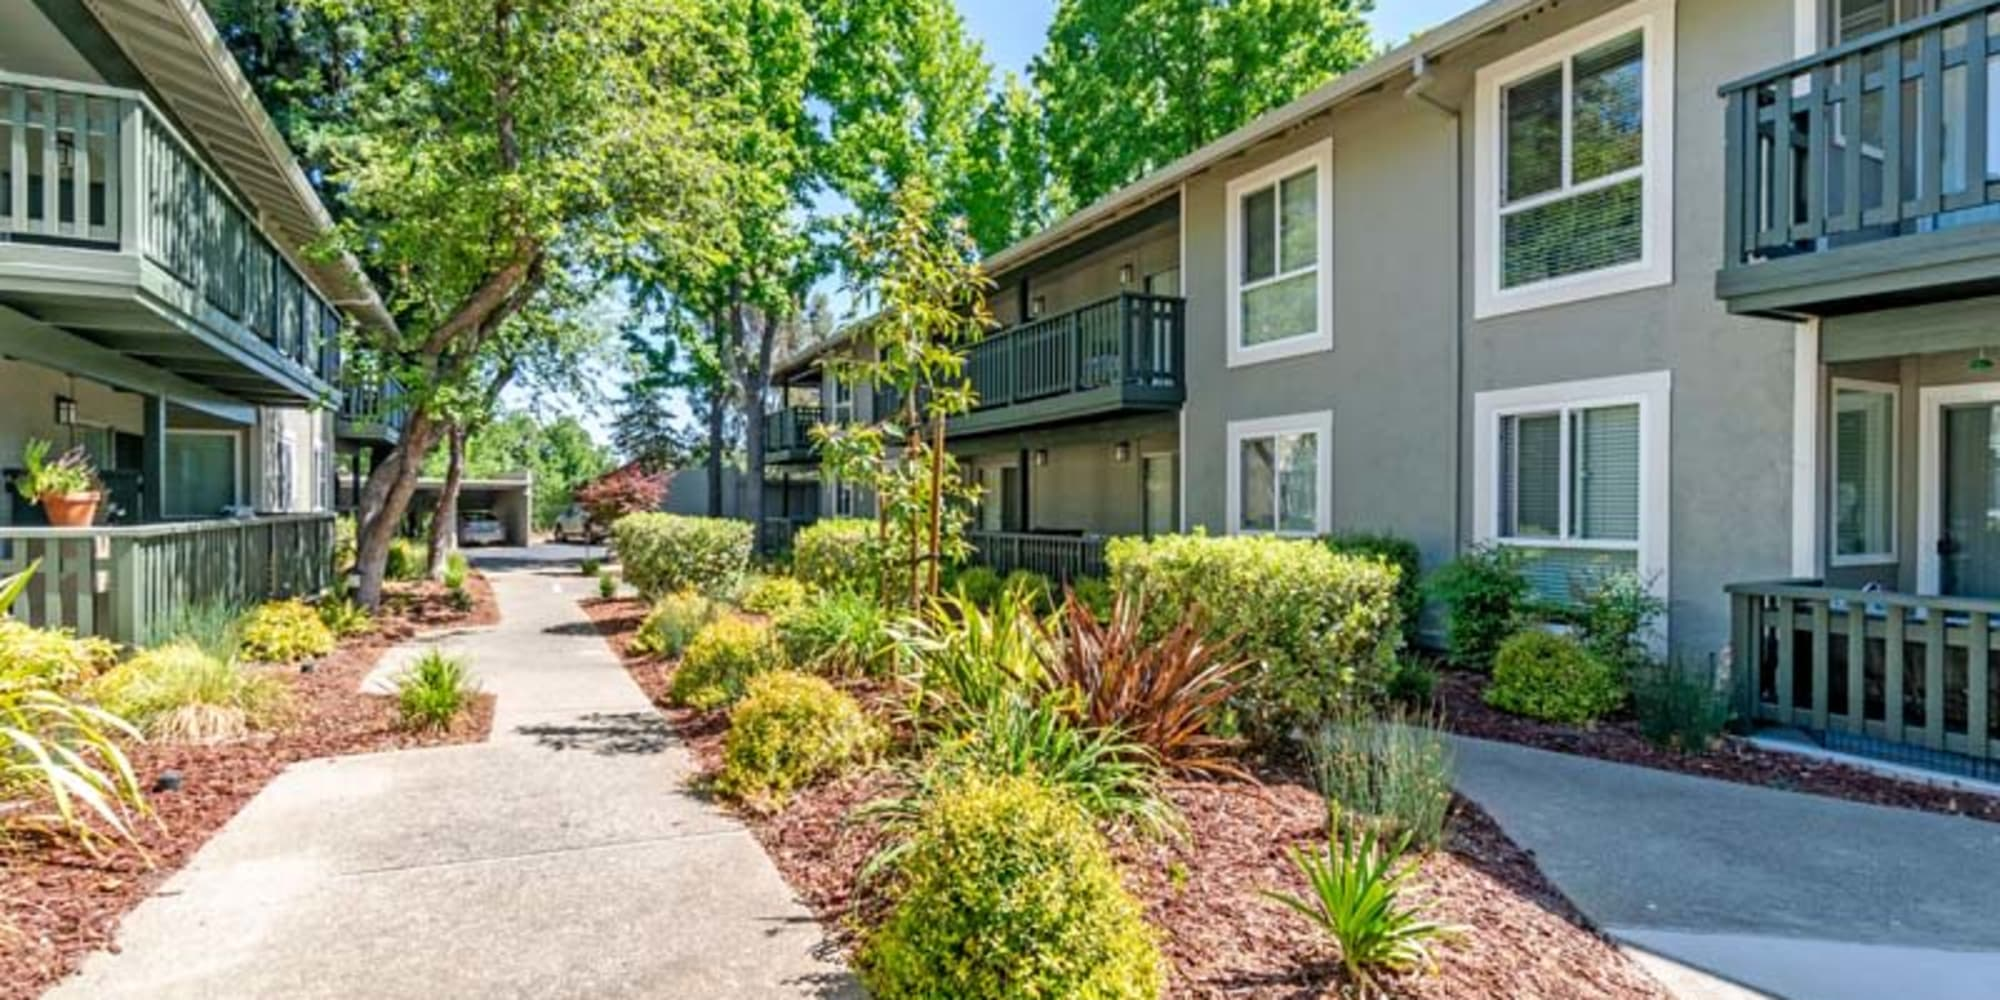 Take a virtual tour of our community at Pleasanton Glen Apartment Homes in Pleasanton, California